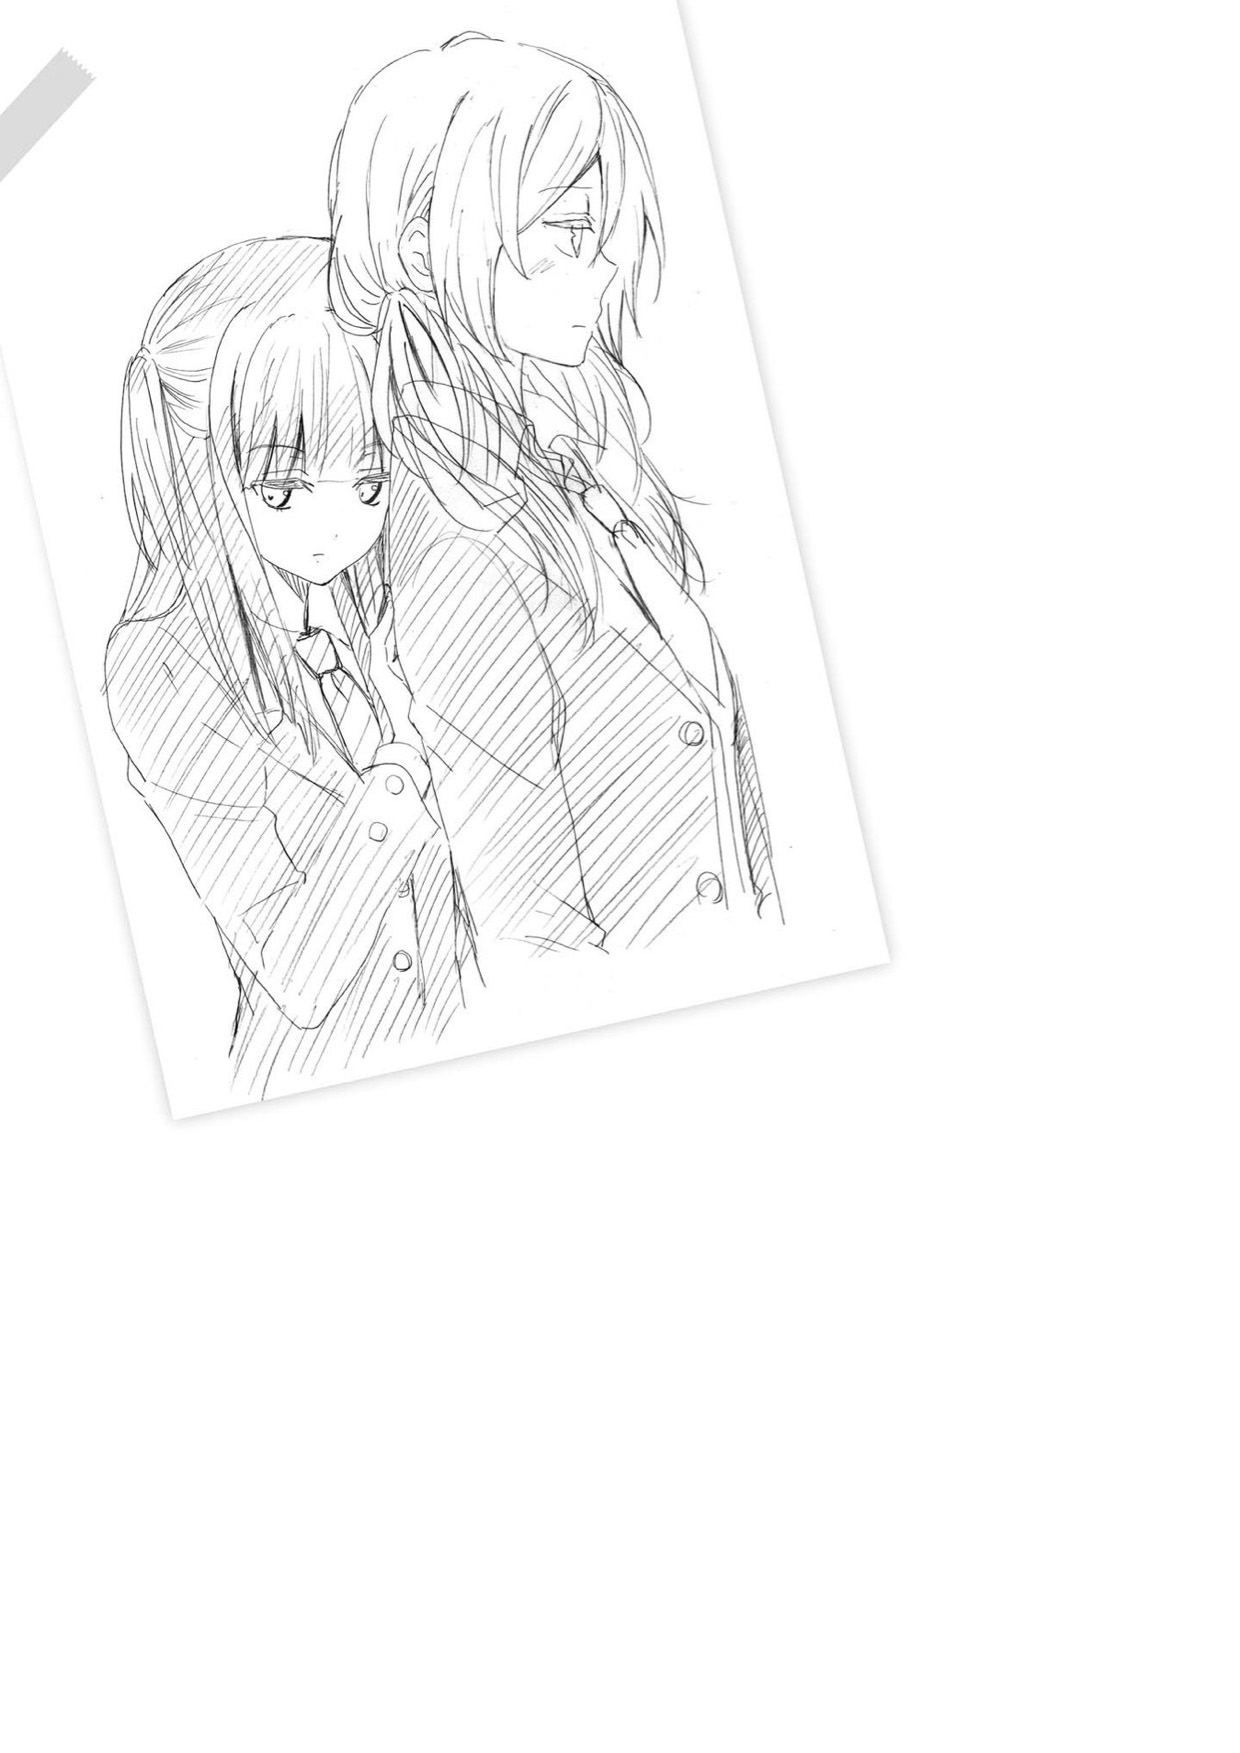 Netsuzou Trap - NTR Chapter 5 5 - MangaHasu